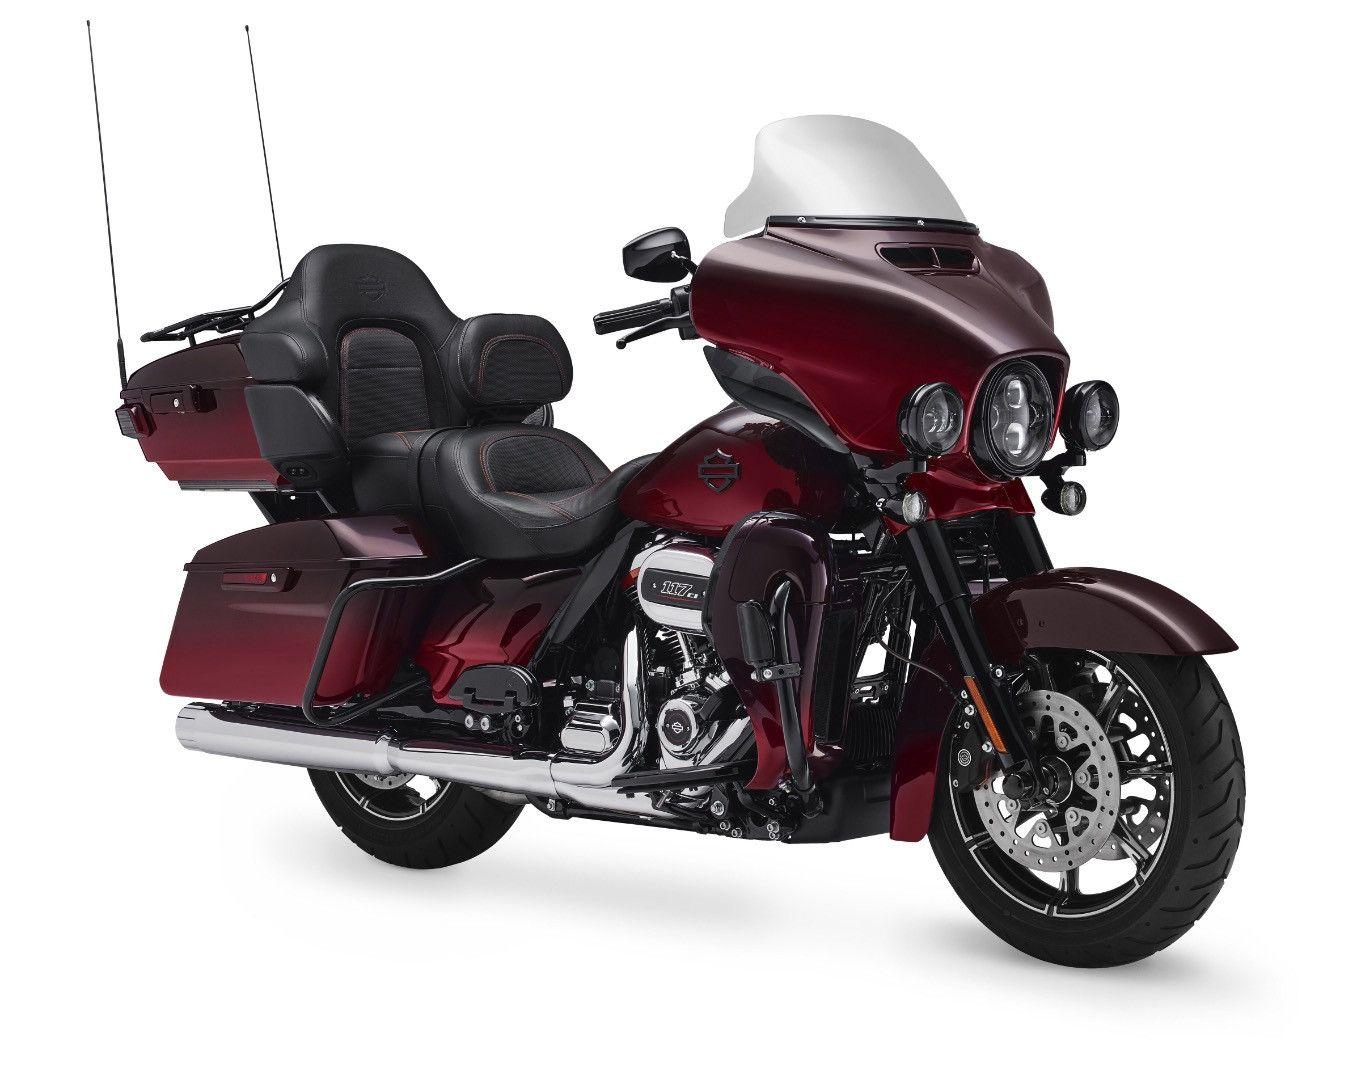 2018 Harley davidson CVO limited Dubai